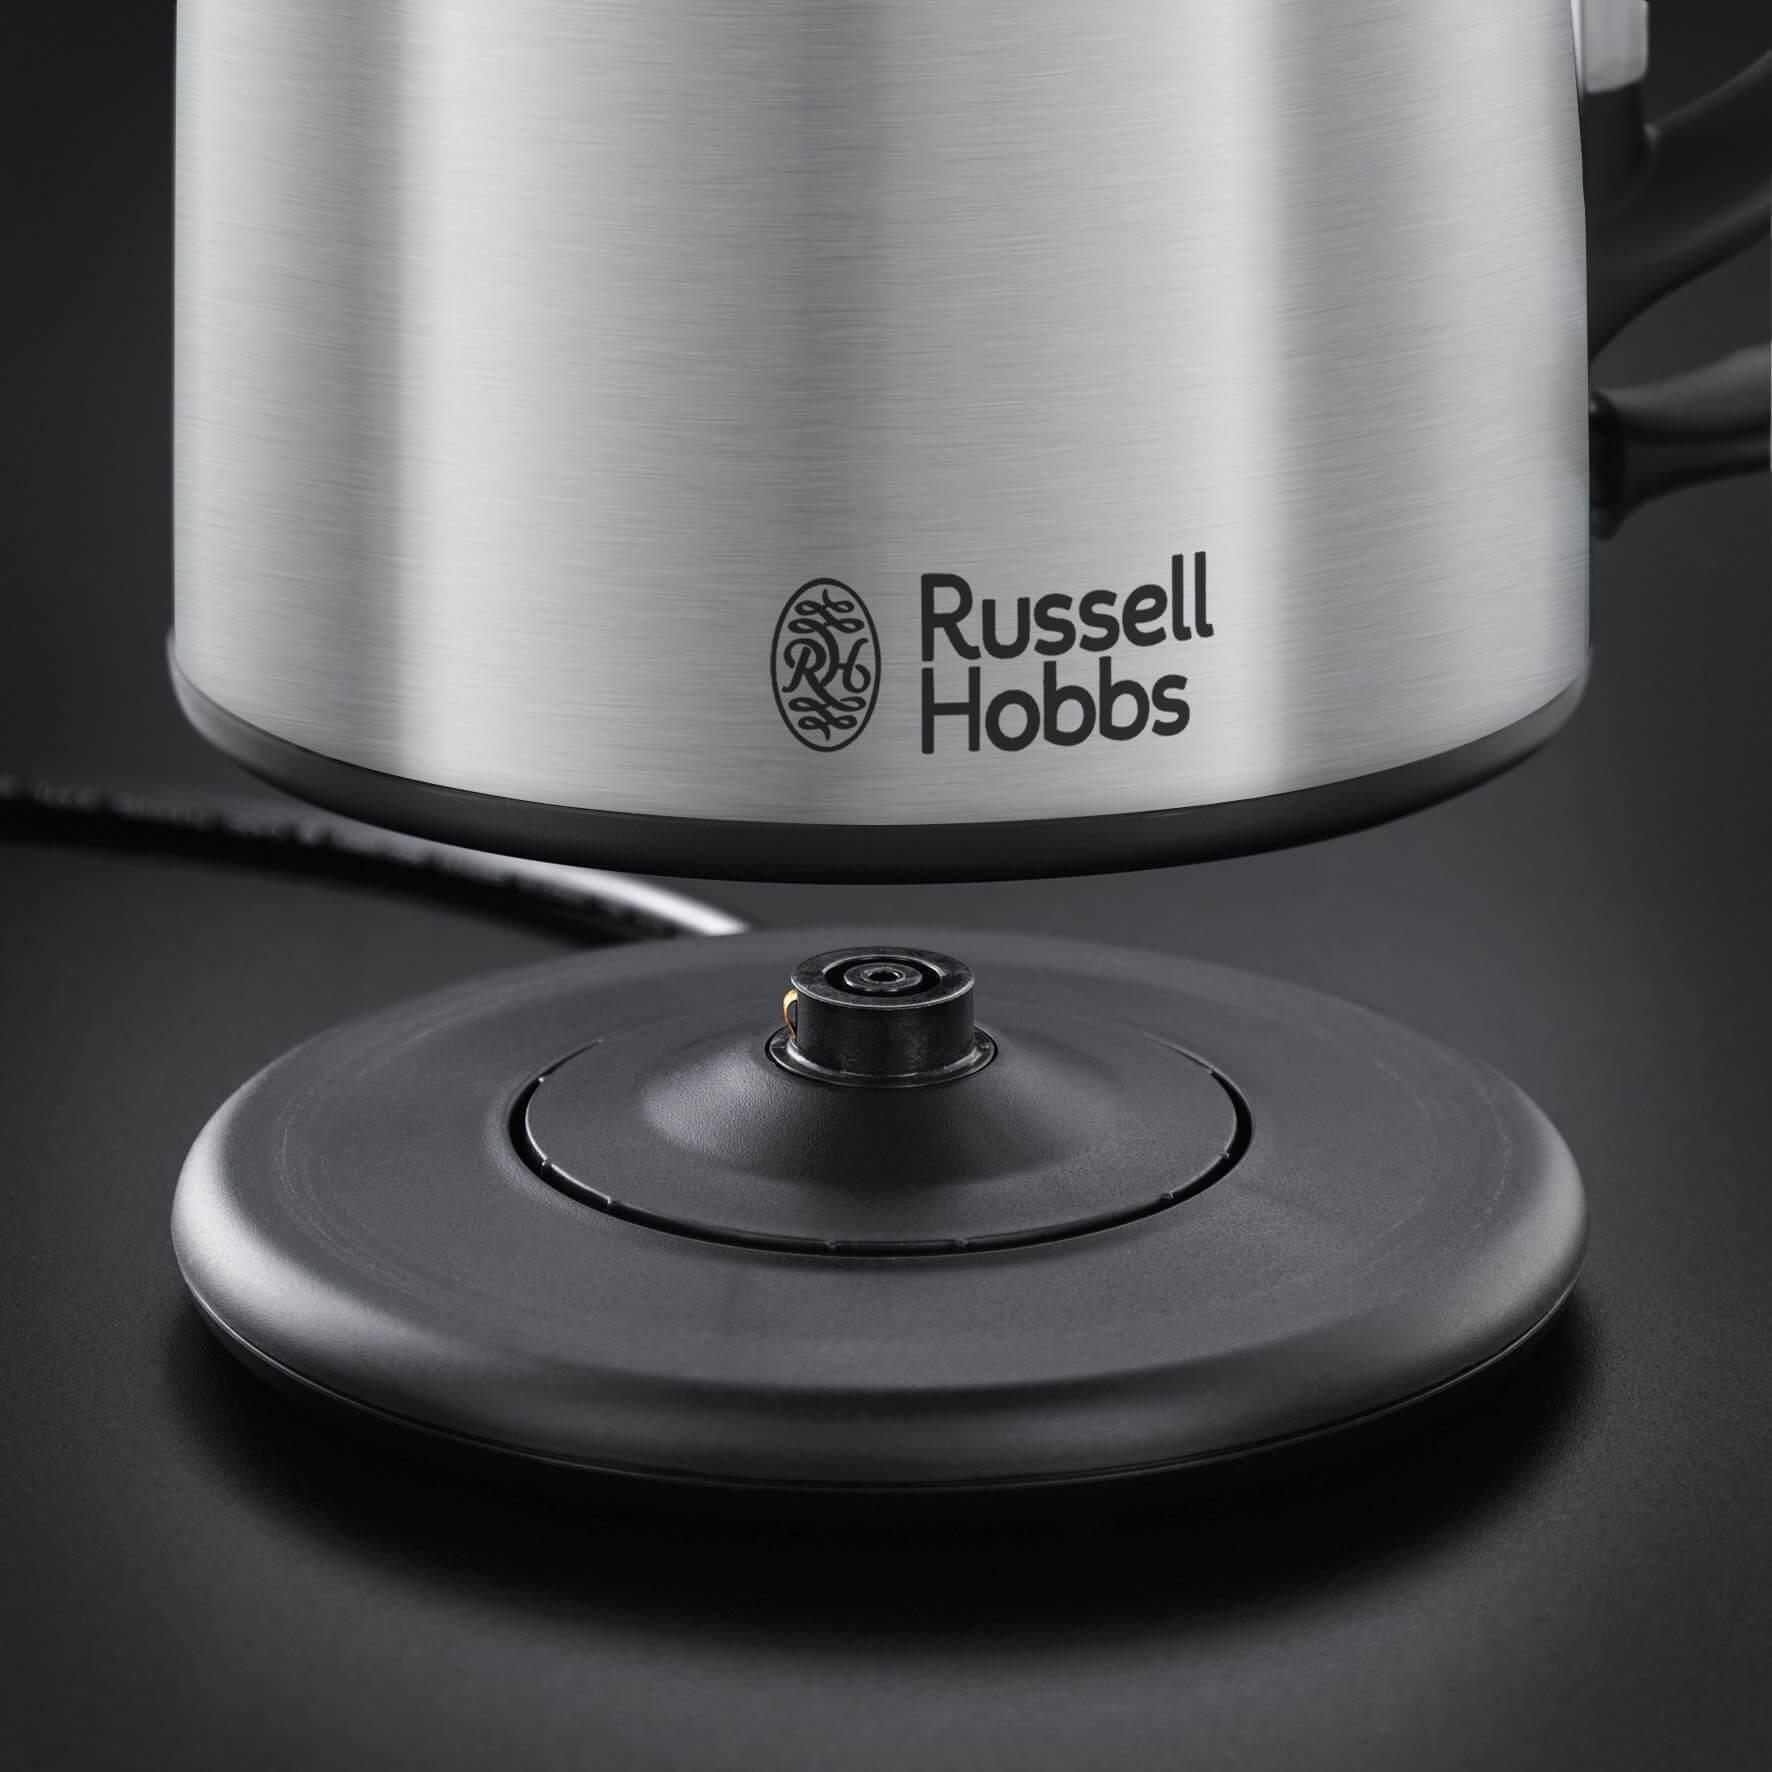 Czajnik  Russell Hobbs Oxford Compact 20195-70